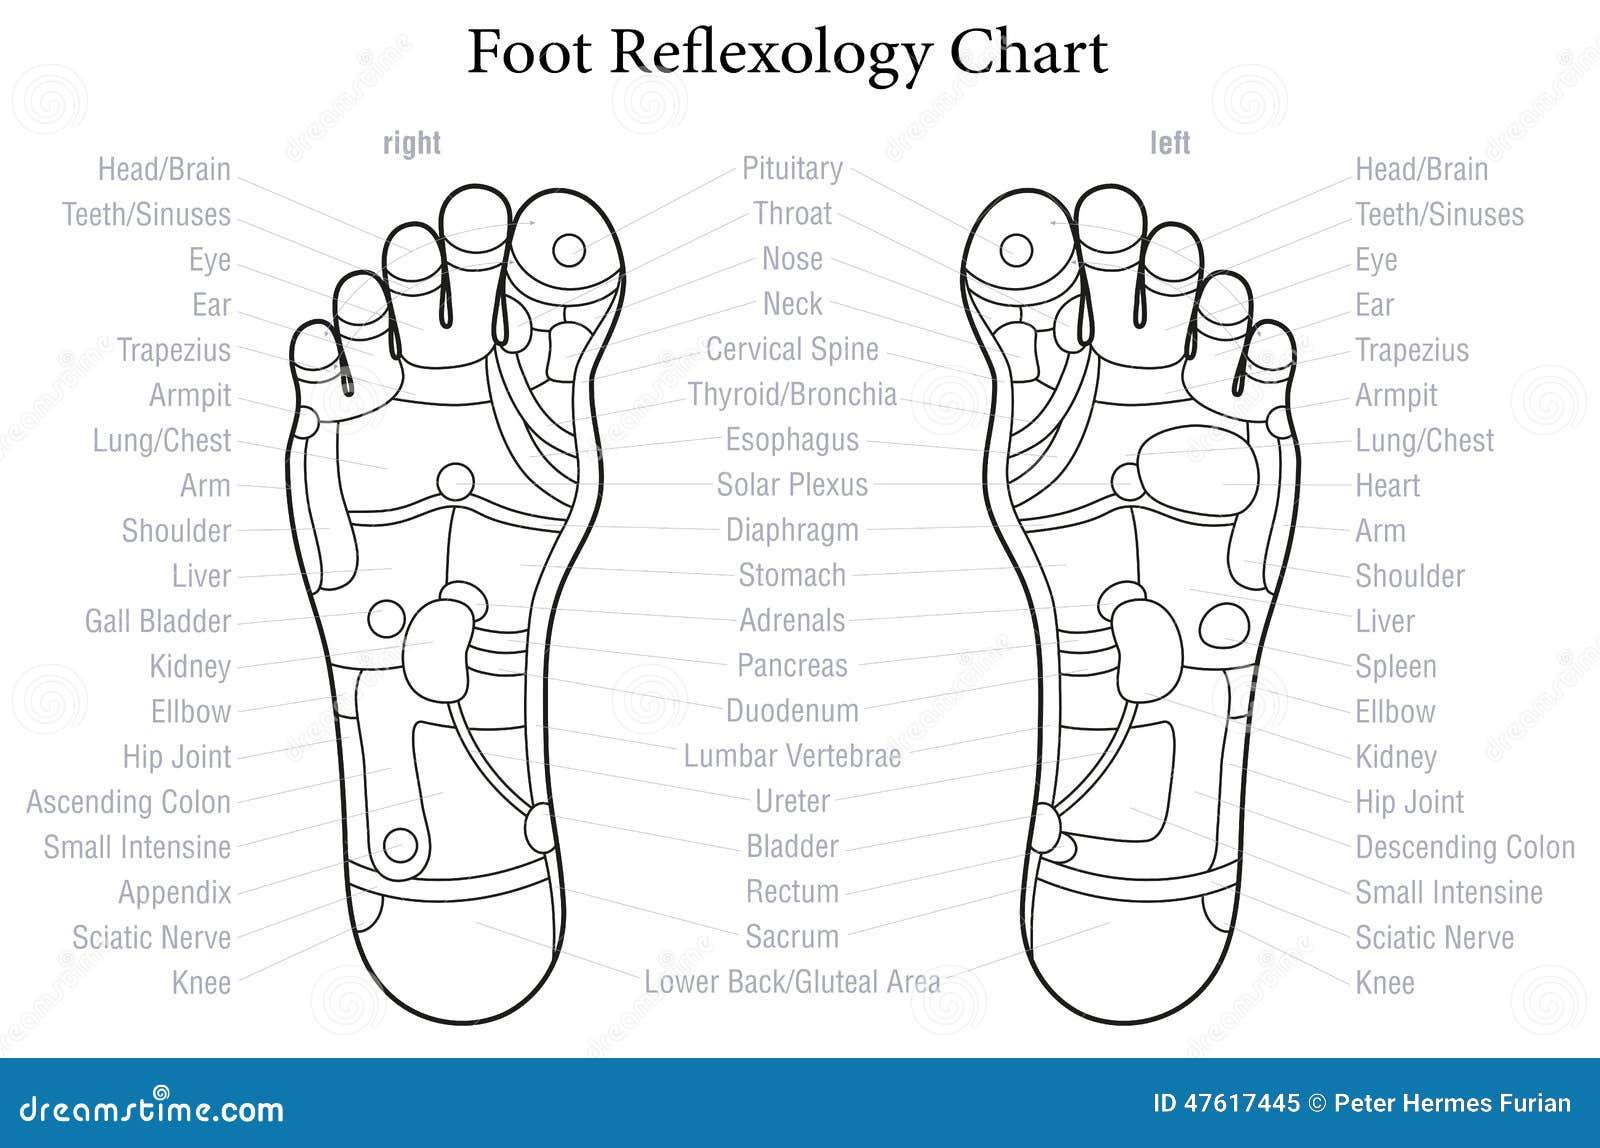 Esquema de la carta del Reflexology del pie